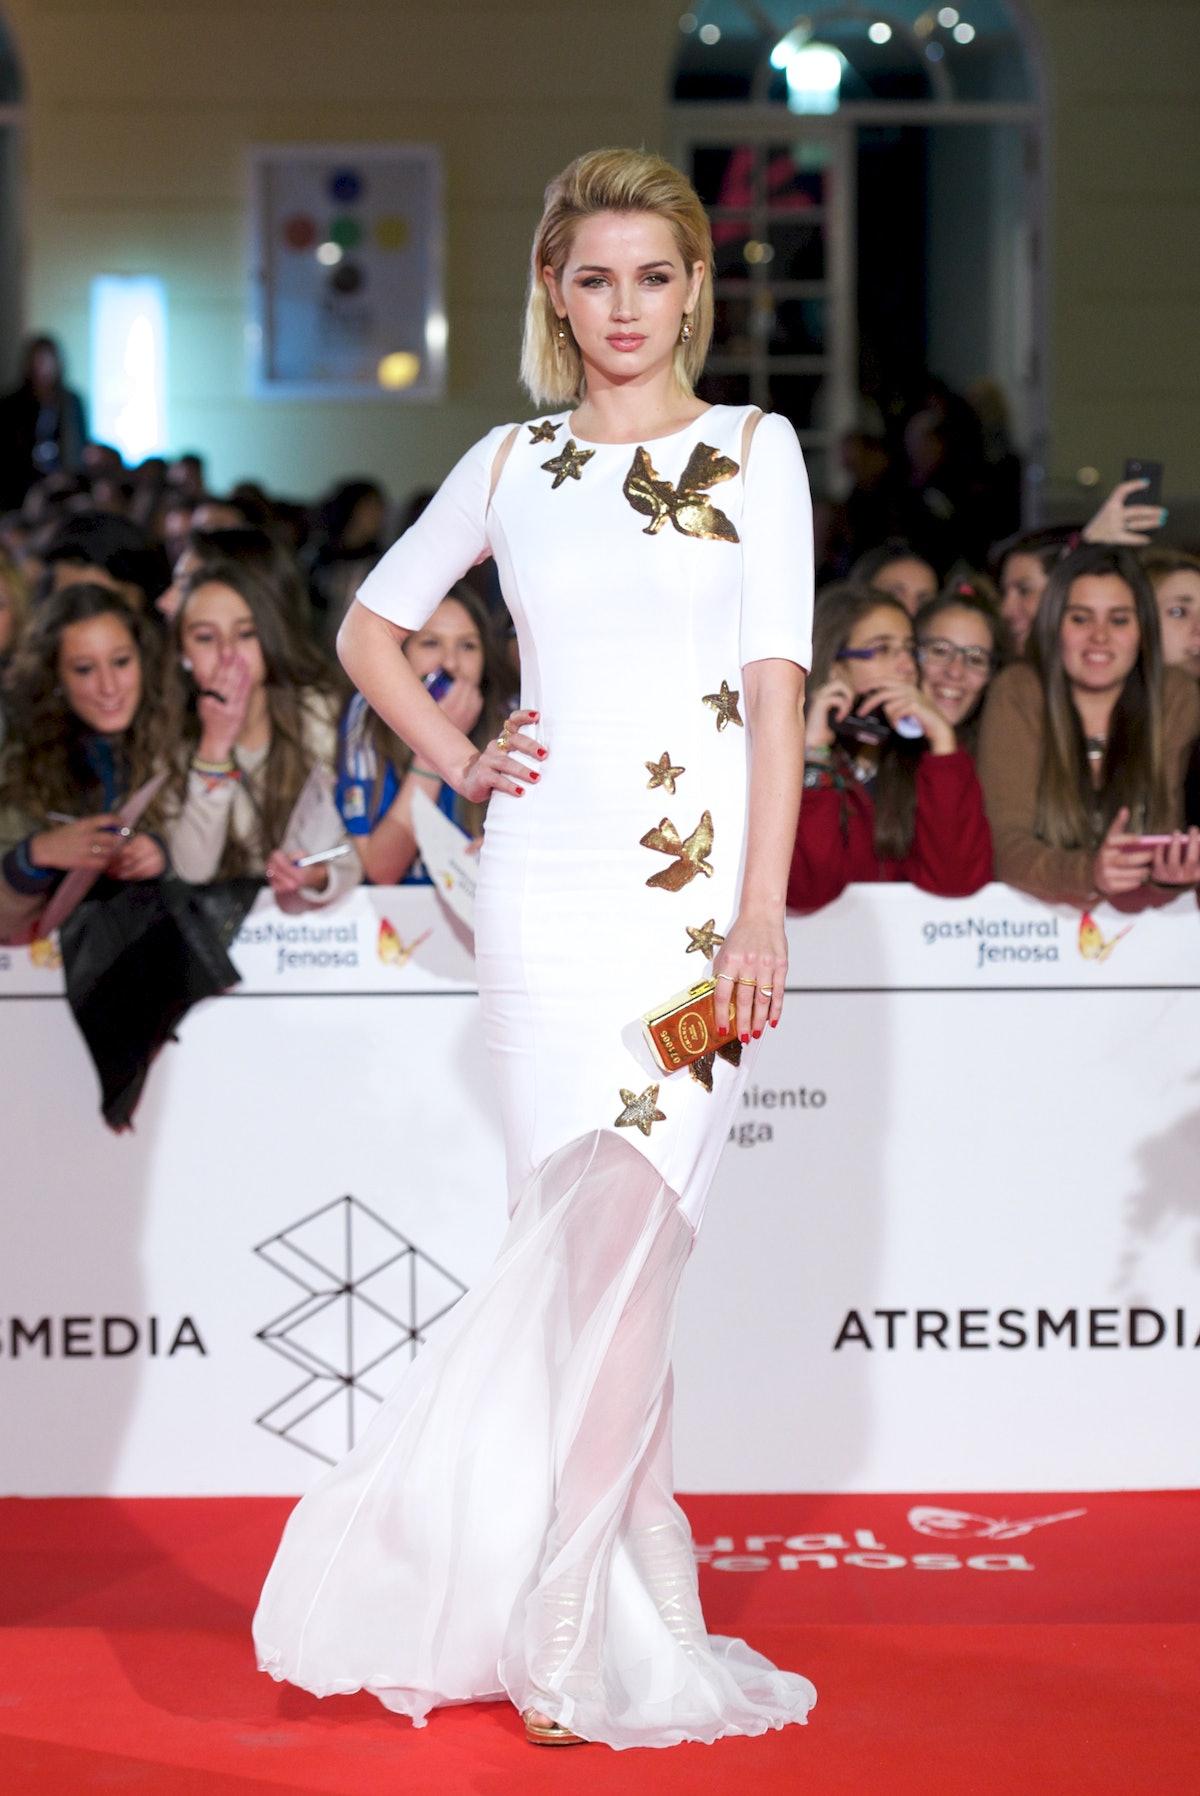 لباس آنا د آرماس سفید و طلایی.